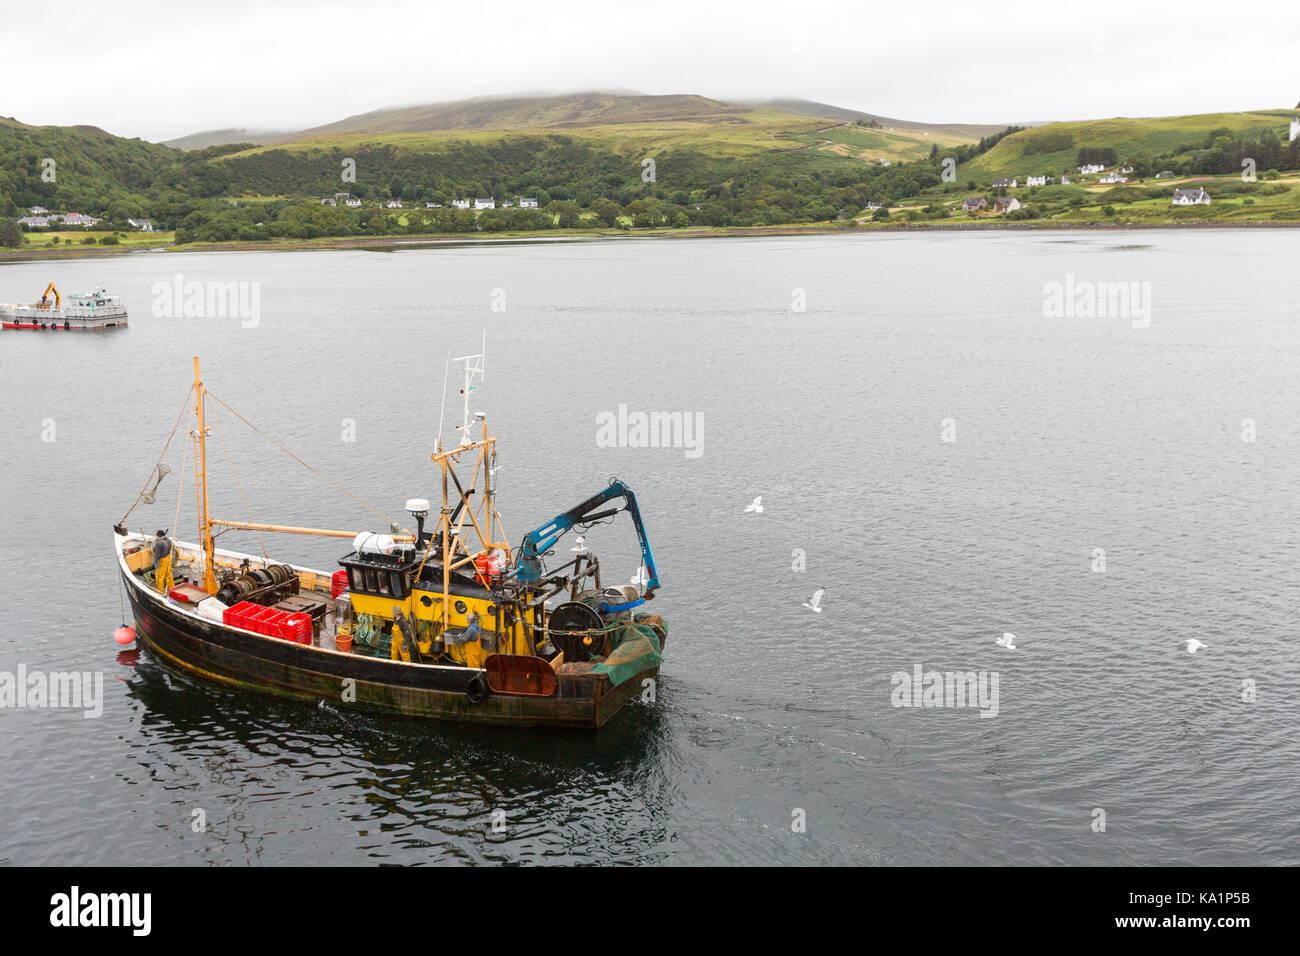 Fishing boat arriving to Uig Harbour with seagulls flying around, Trotternish peninsula, Isle of Skye, Scotland. - Stock Image